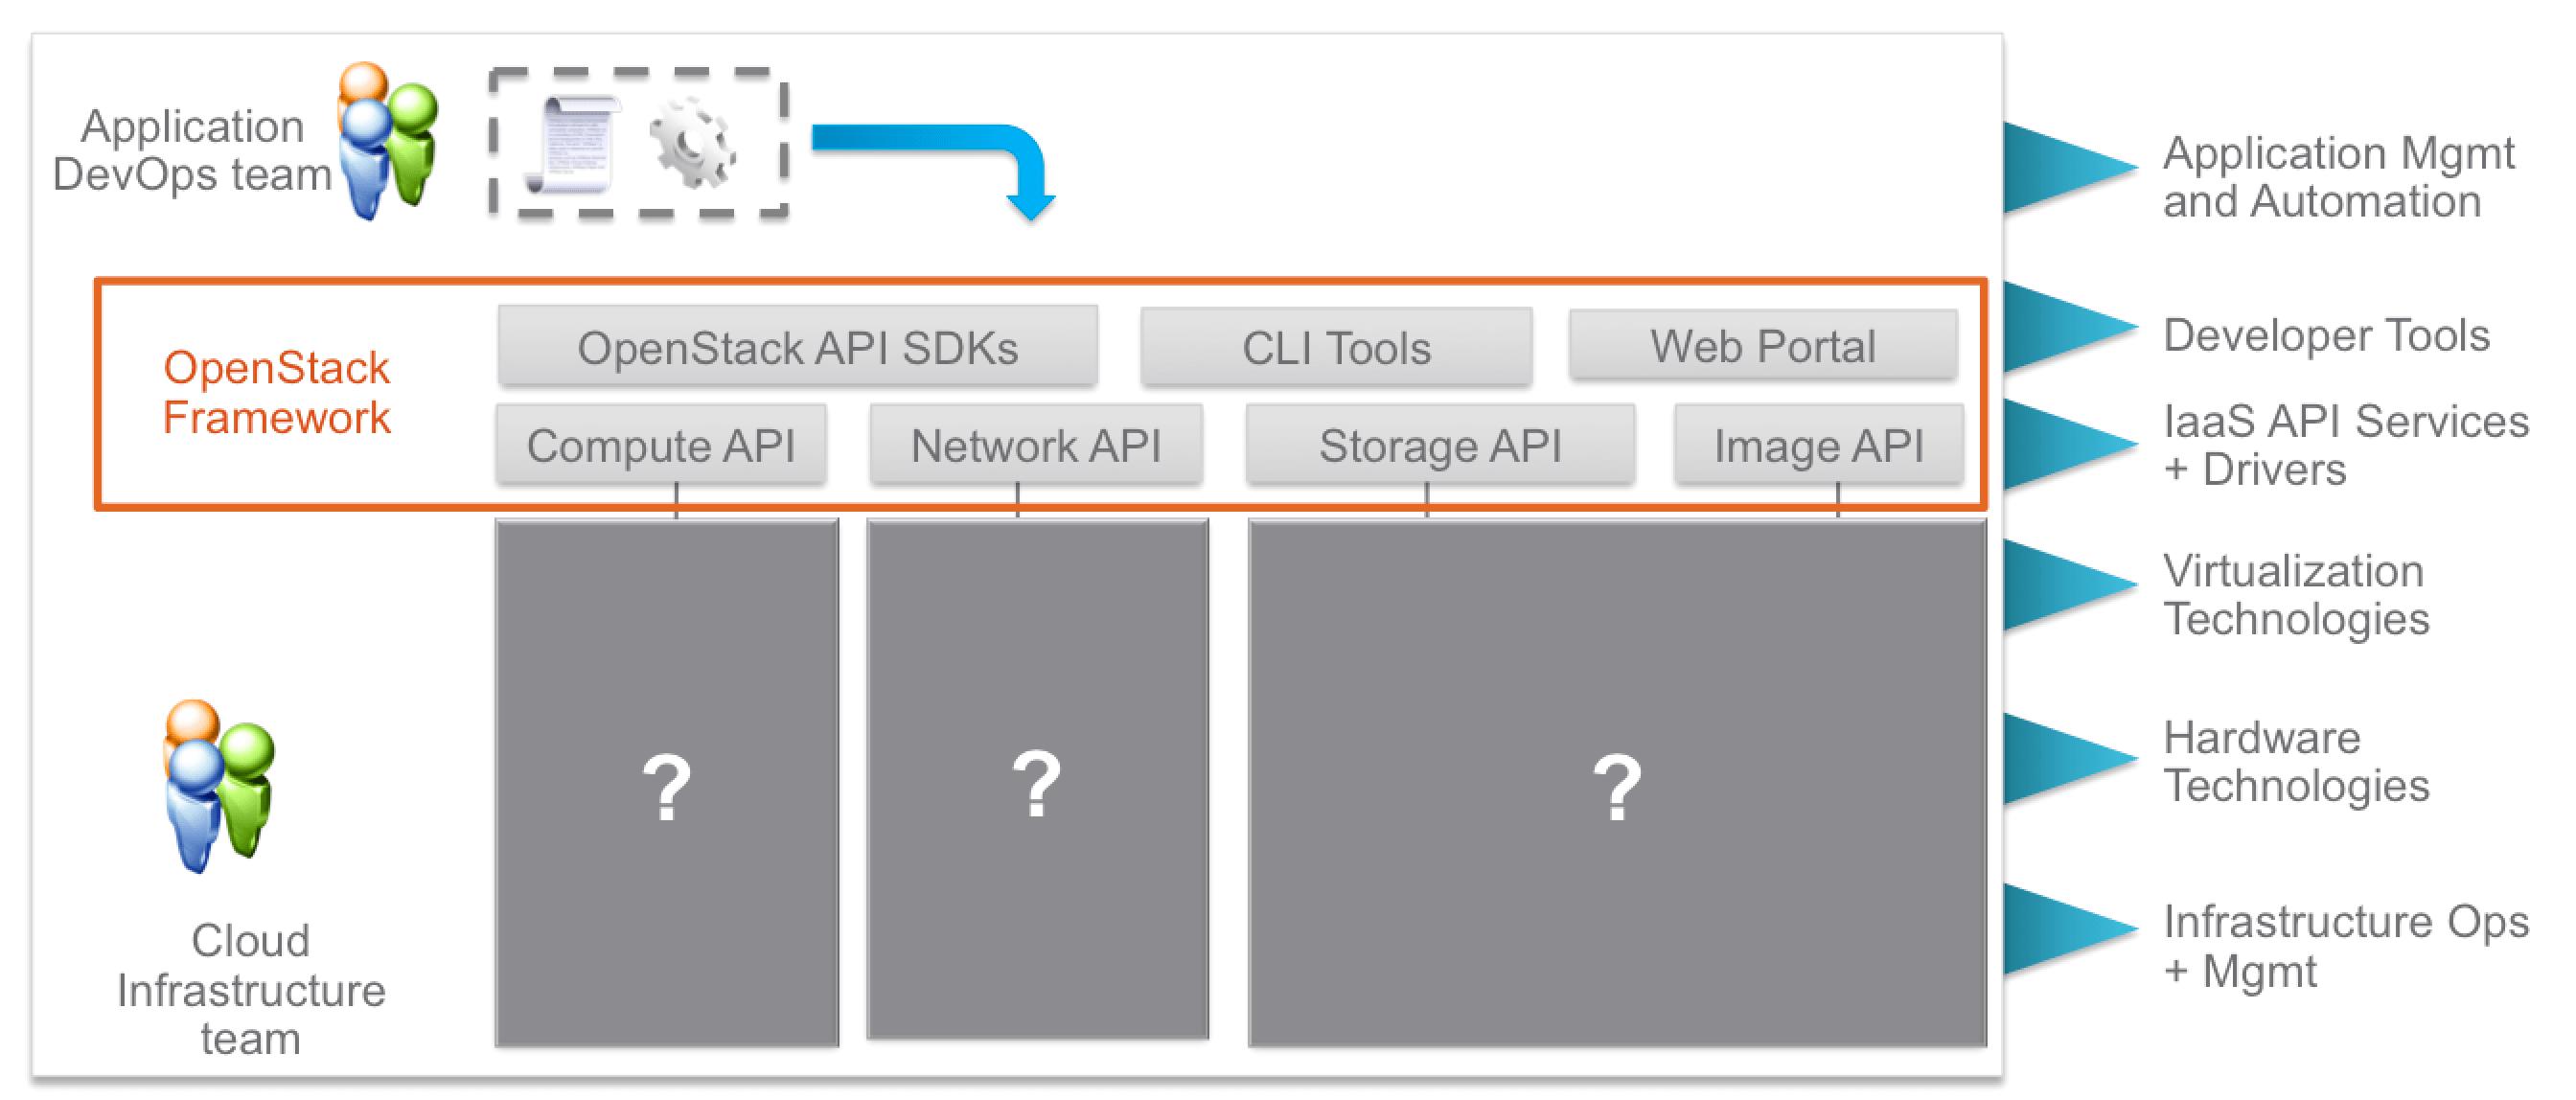 VMworld 2016: VMware Integrated OpenStack 3.0 announced